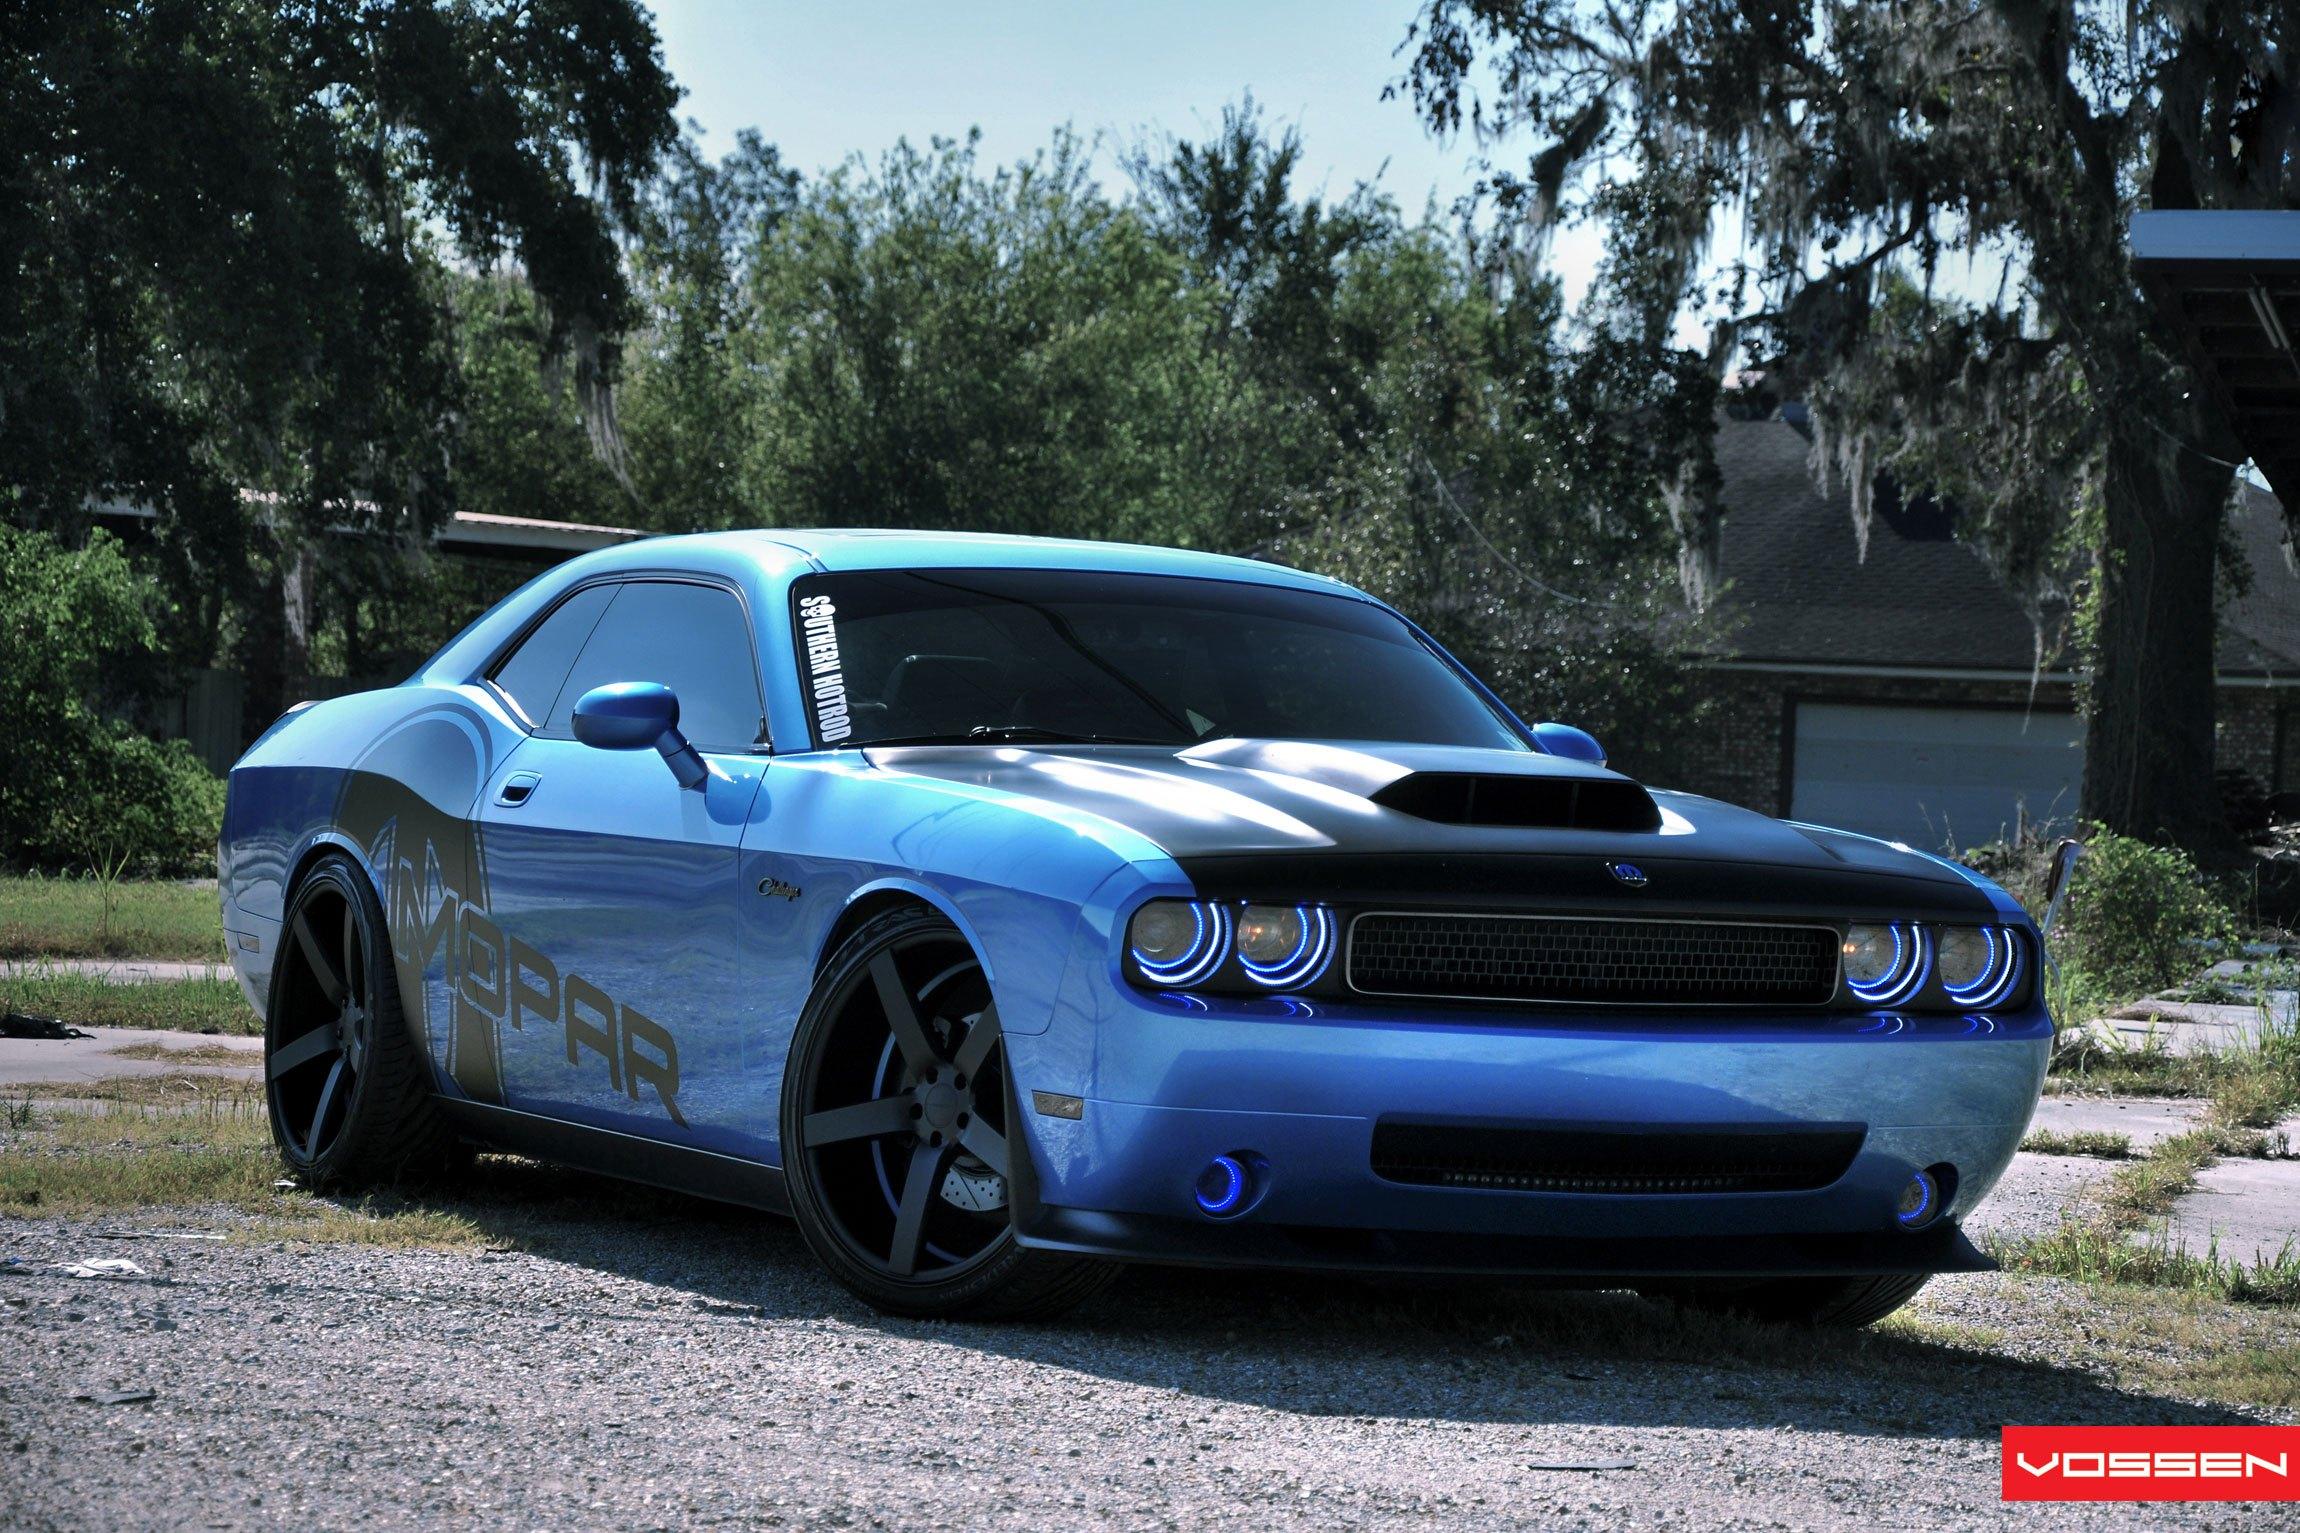 Mopar or no Car: Customized Blue Dodge Challenger — CARiD.com Gallery